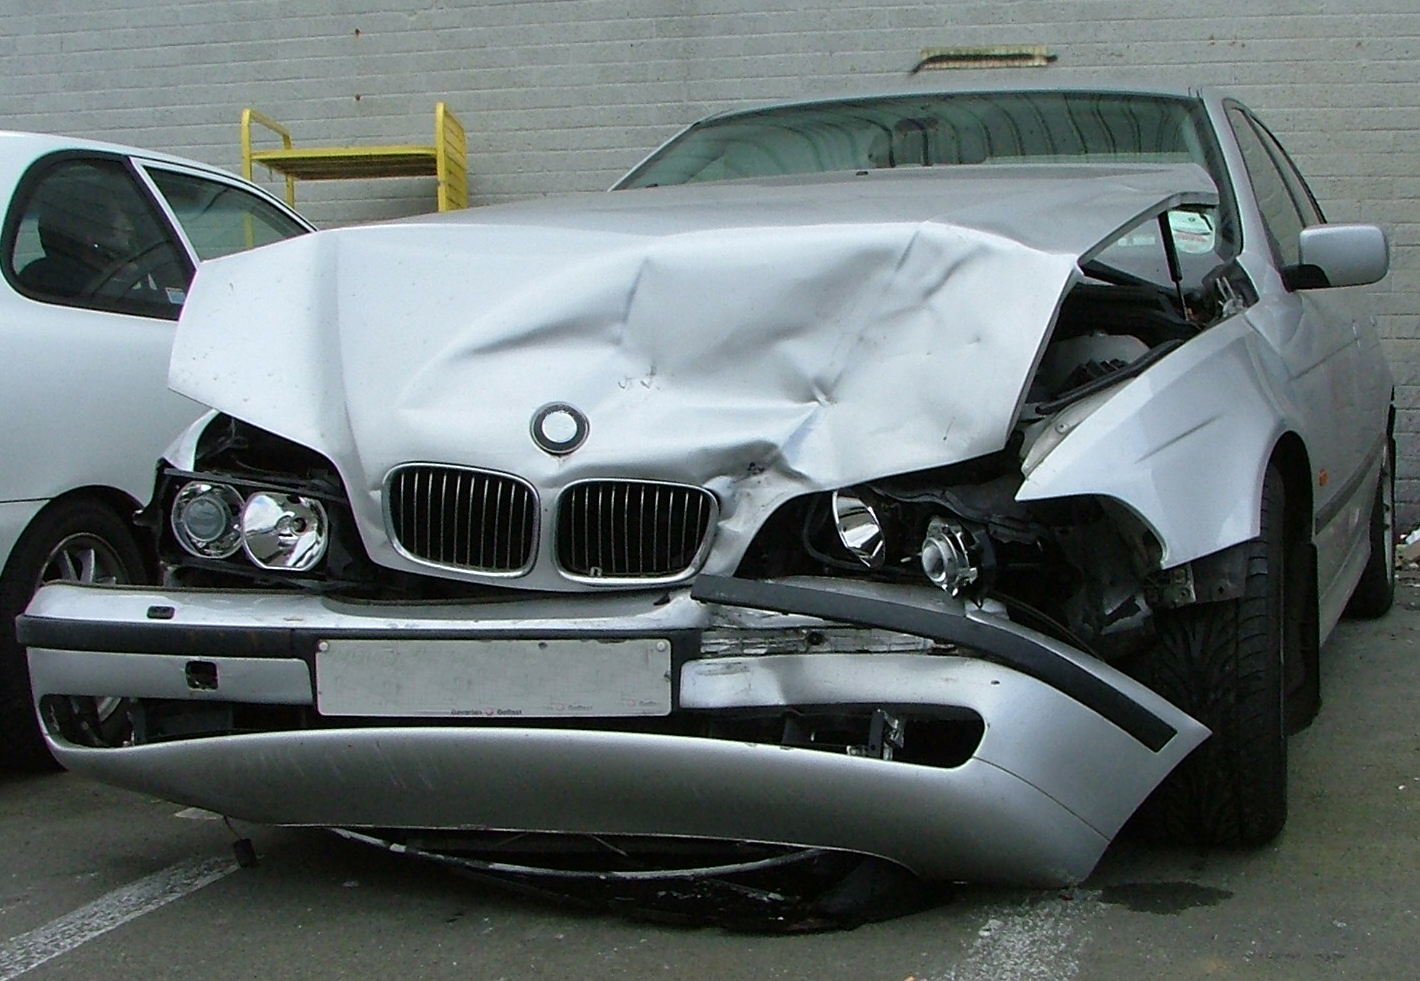 Speedmonkey The Saddest Looking Car Ever